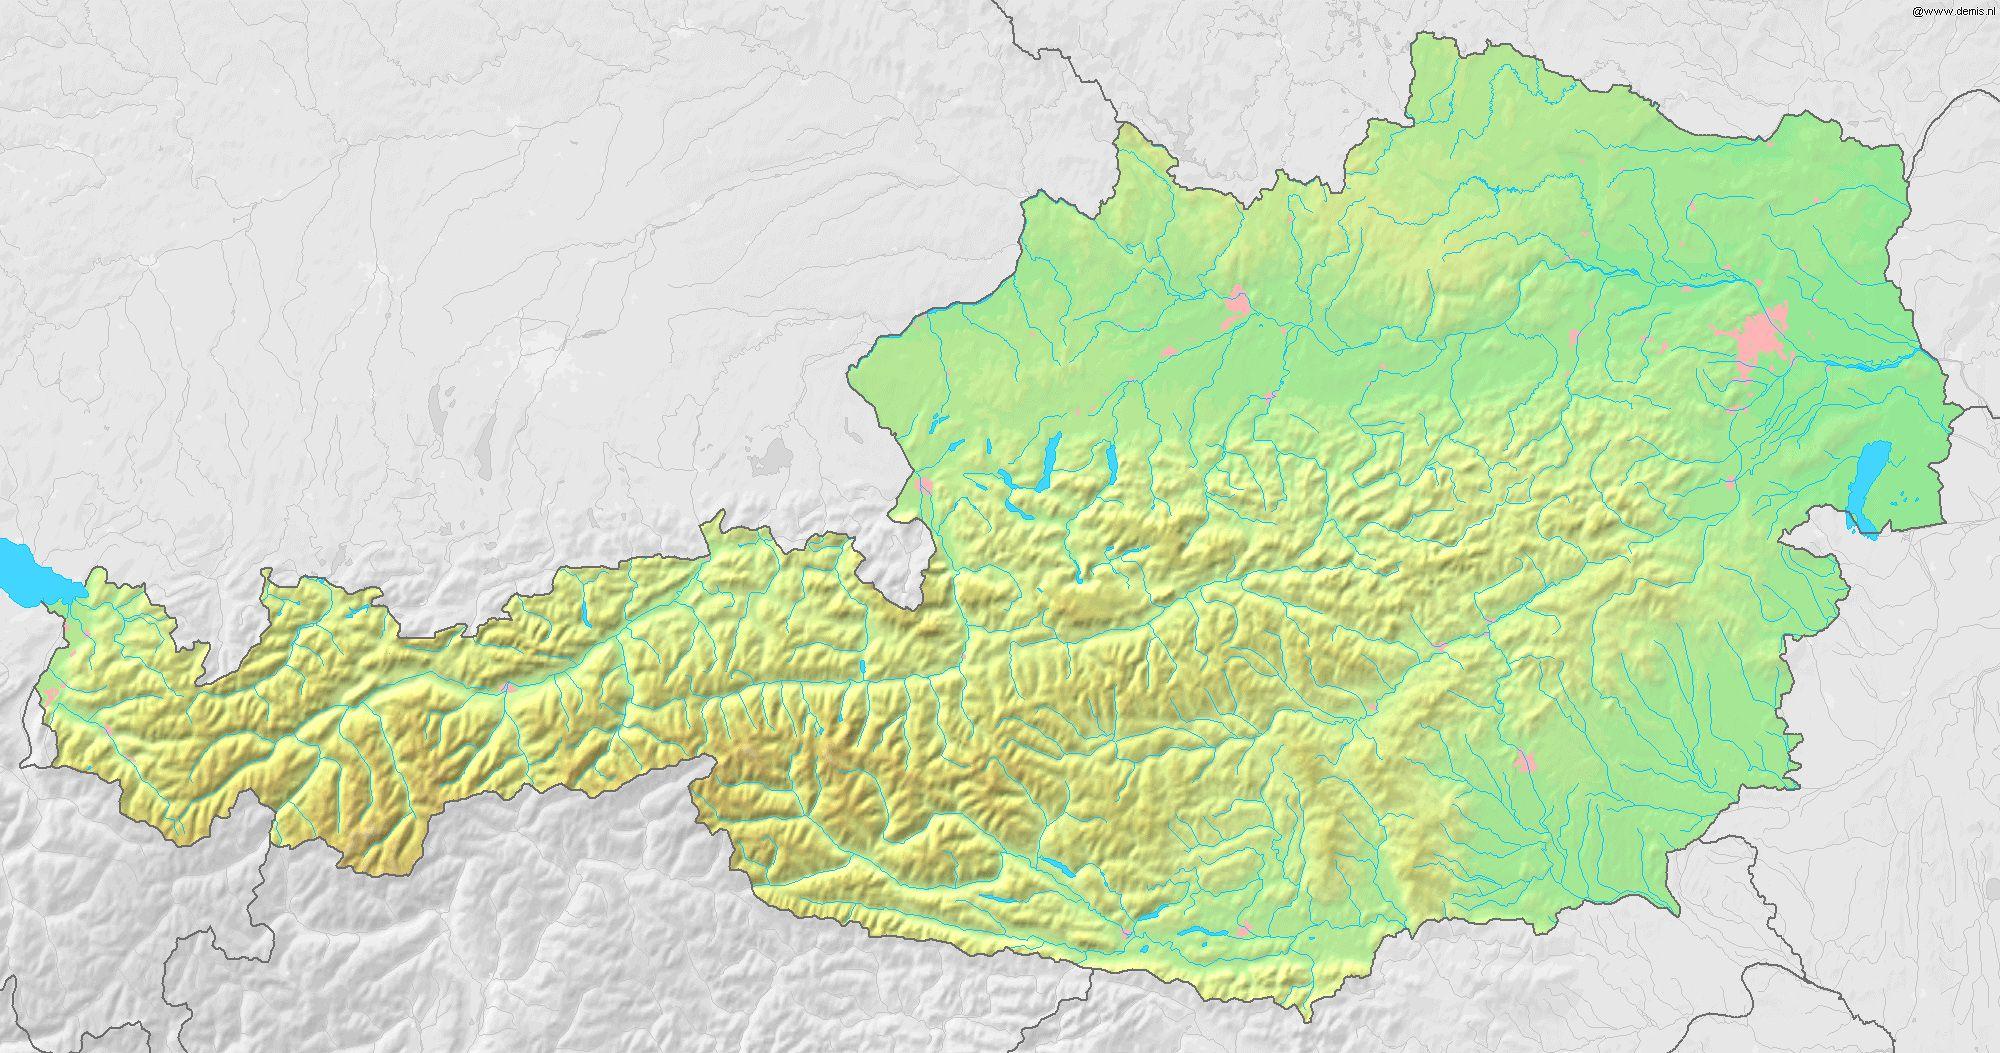 topographic map of austria Austria Topography Map Austria Detailed Topographic Map